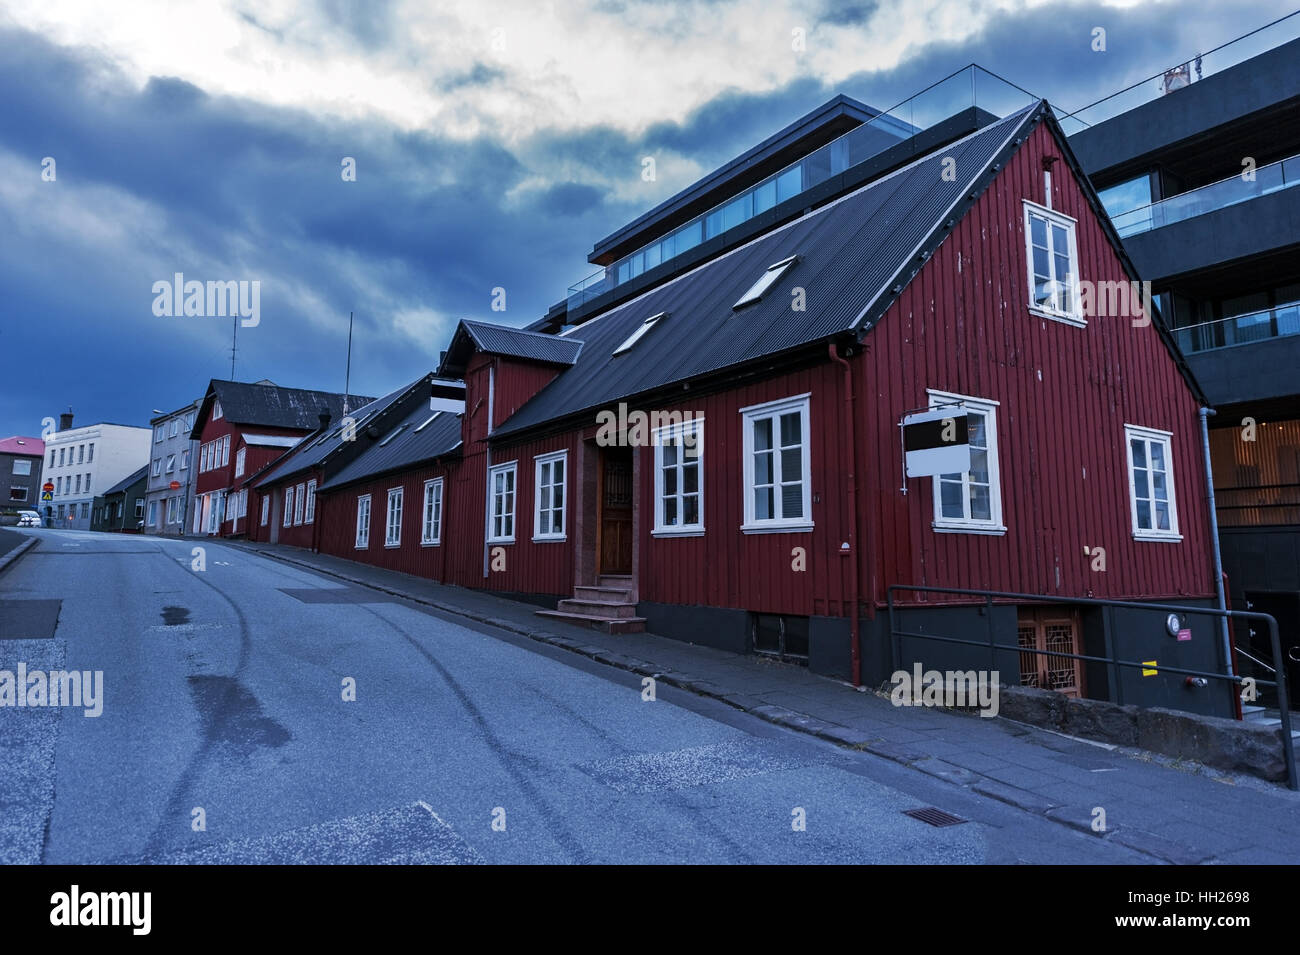 icelandic sreet - Stock Image